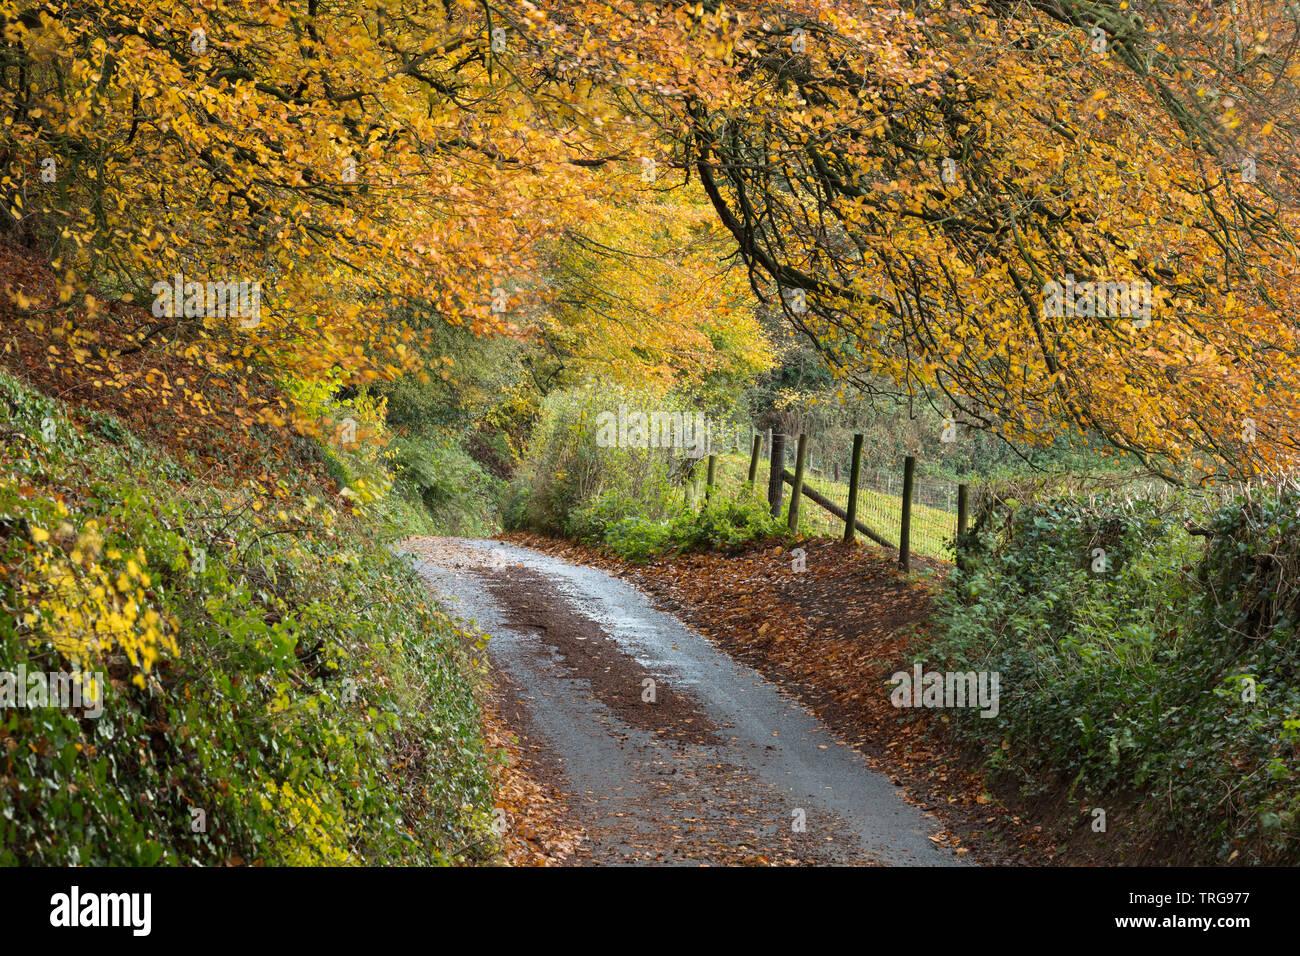 Autumn colours along the road, Corton Hill, Somerset, England, UK Stock Photo